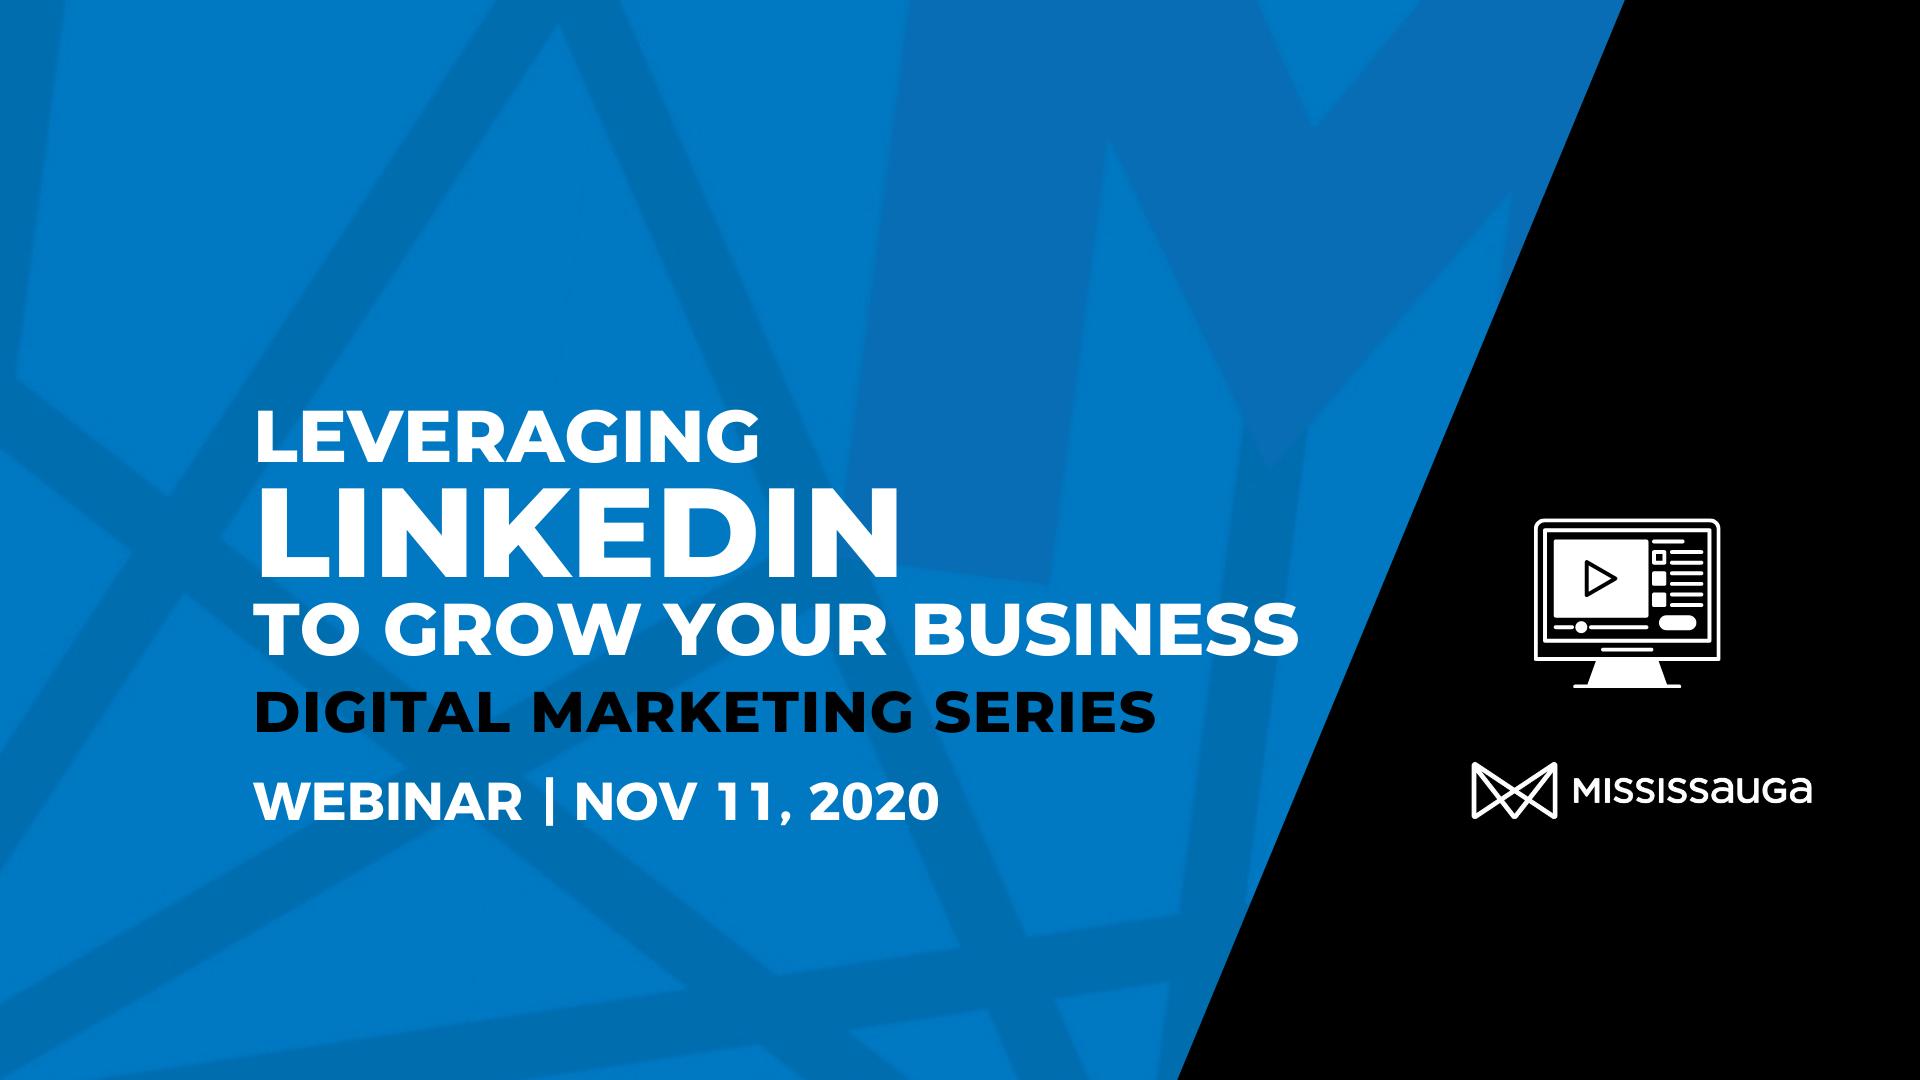 Leveraging LinkedIn to Grow your Business – Webinar, Nov 11